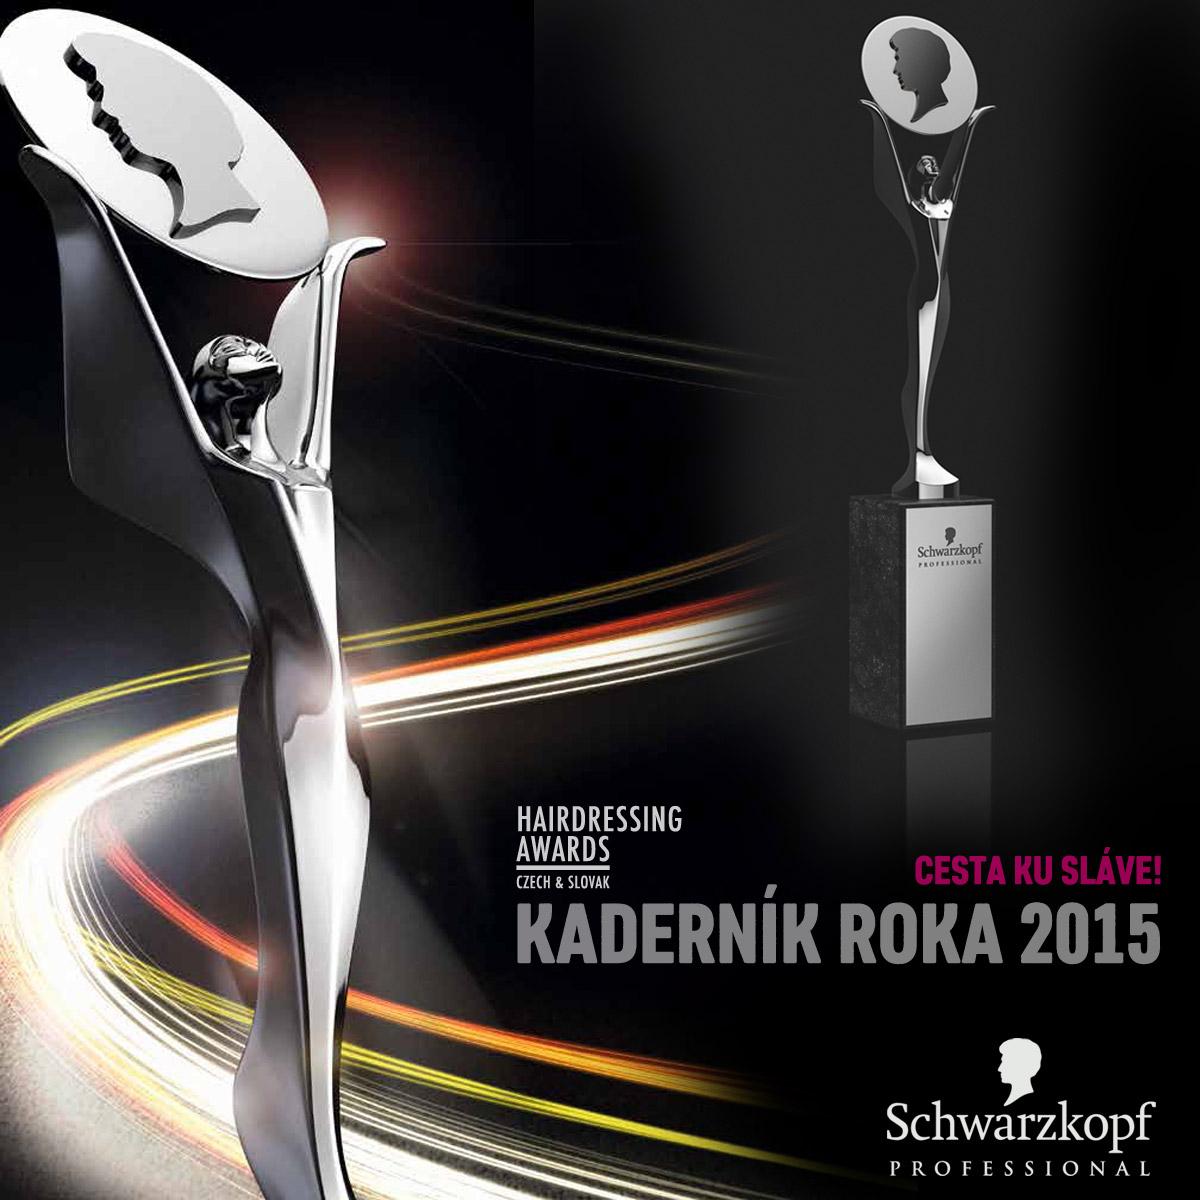 Cena Czech and Slovak Hairdressing Awards – kto ju získa za rok 2015?